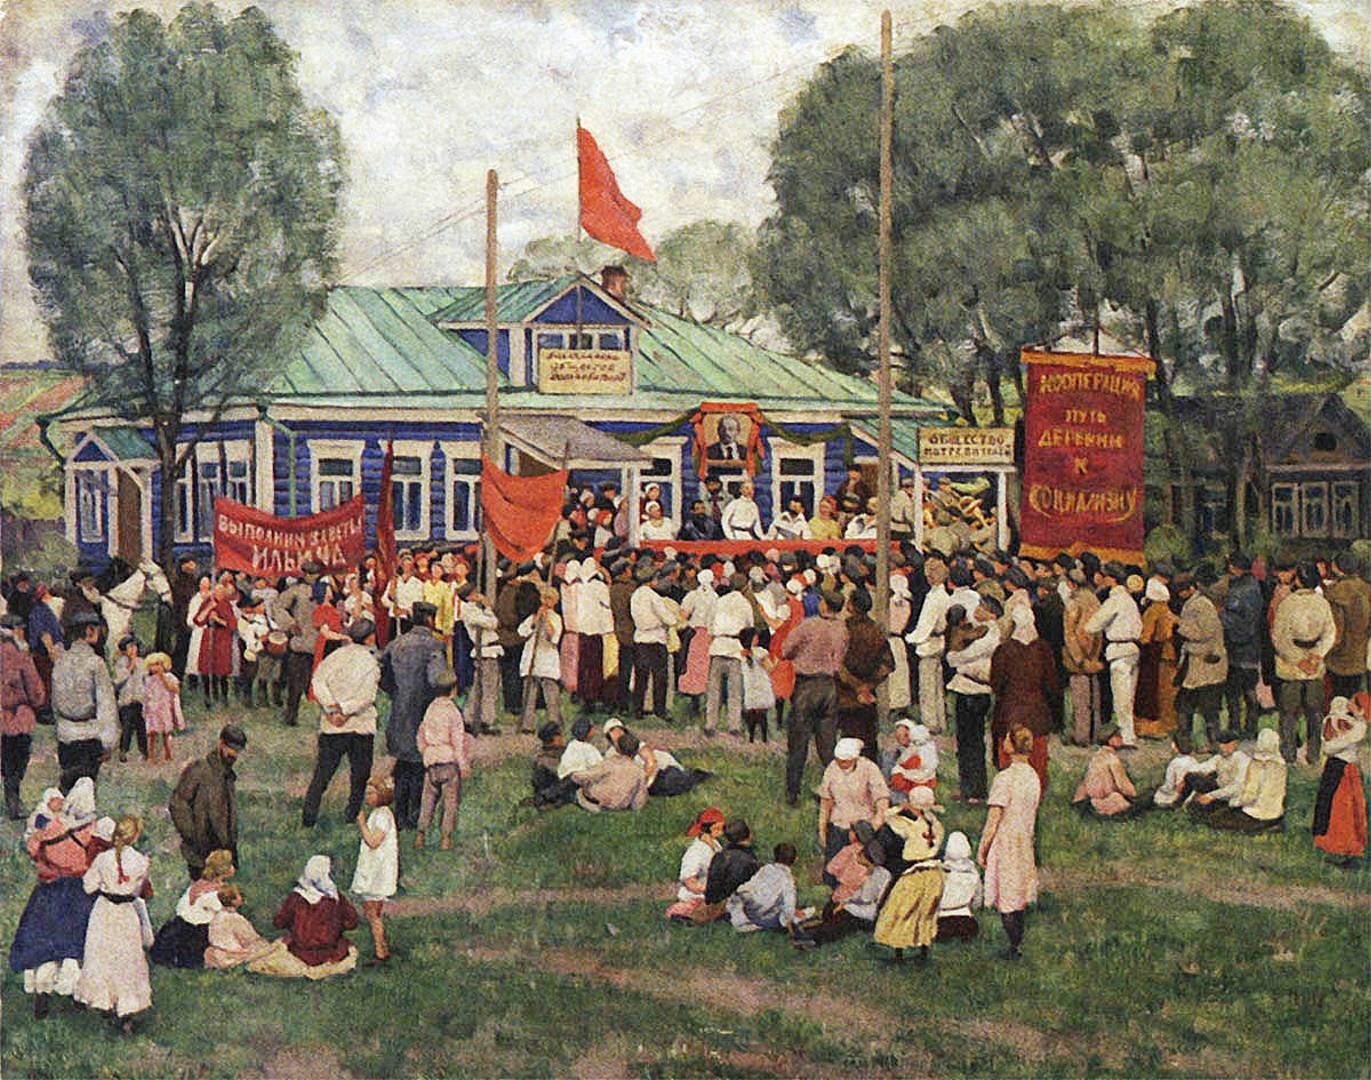 Константин Юон. Праздник кооперации в деревне. 1928